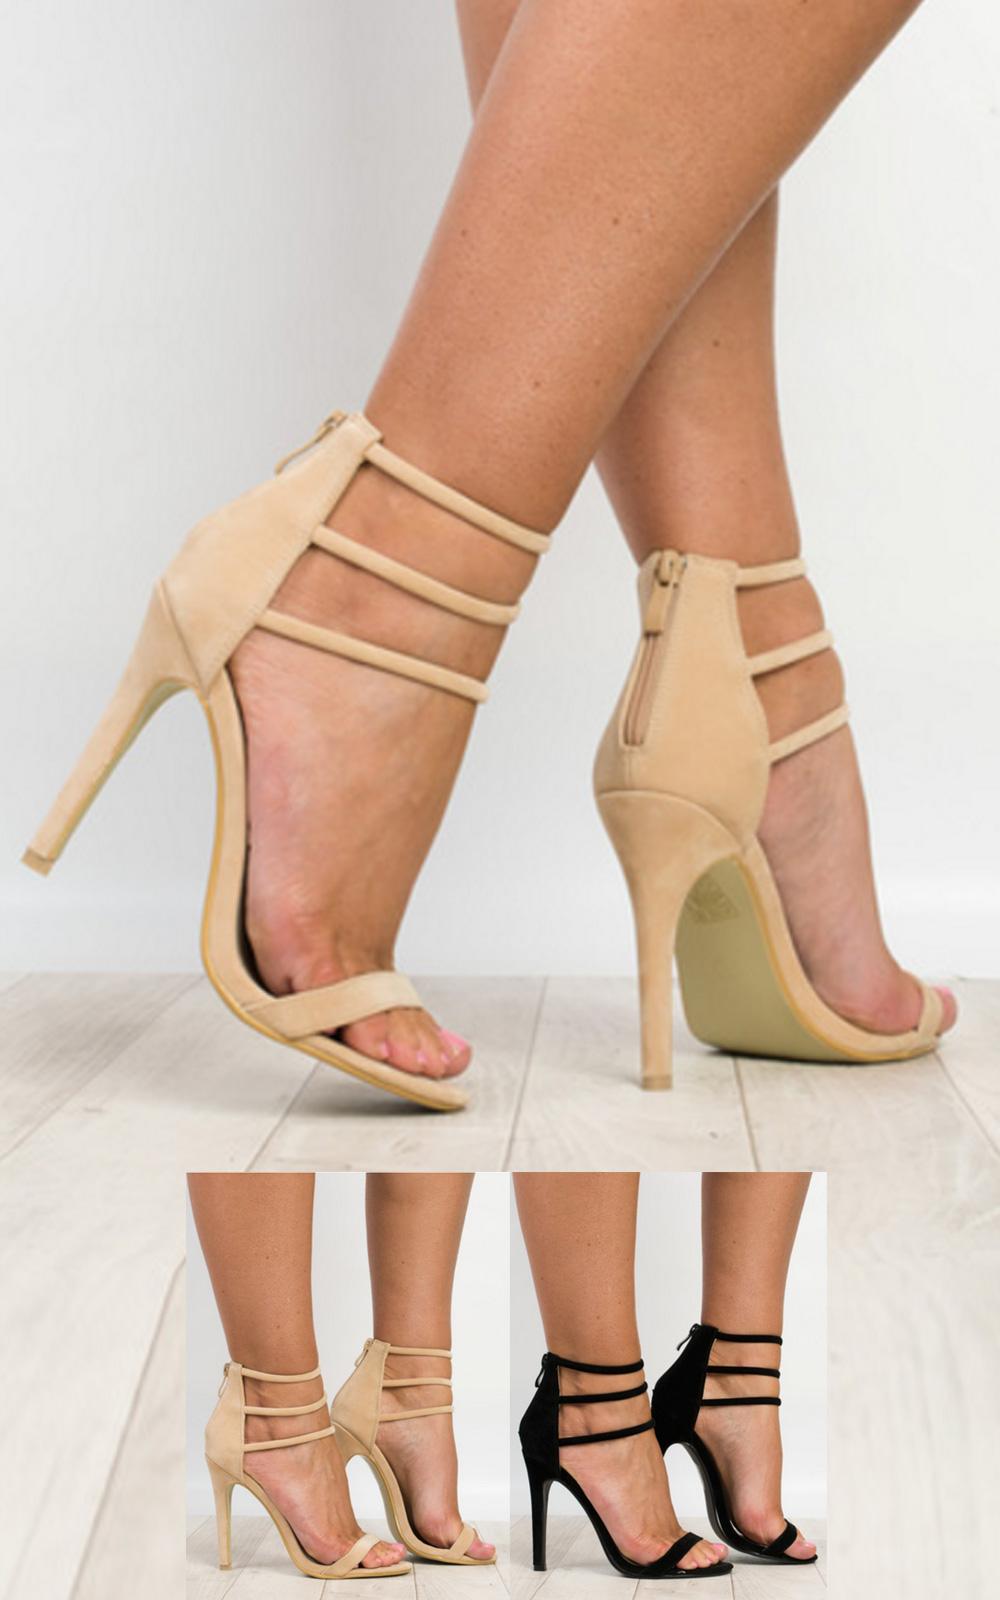 women 39 s ladies stunning strappy glam celeb party high heels ebay. Black Bedroom Furniture Sets. Home Design Ideas